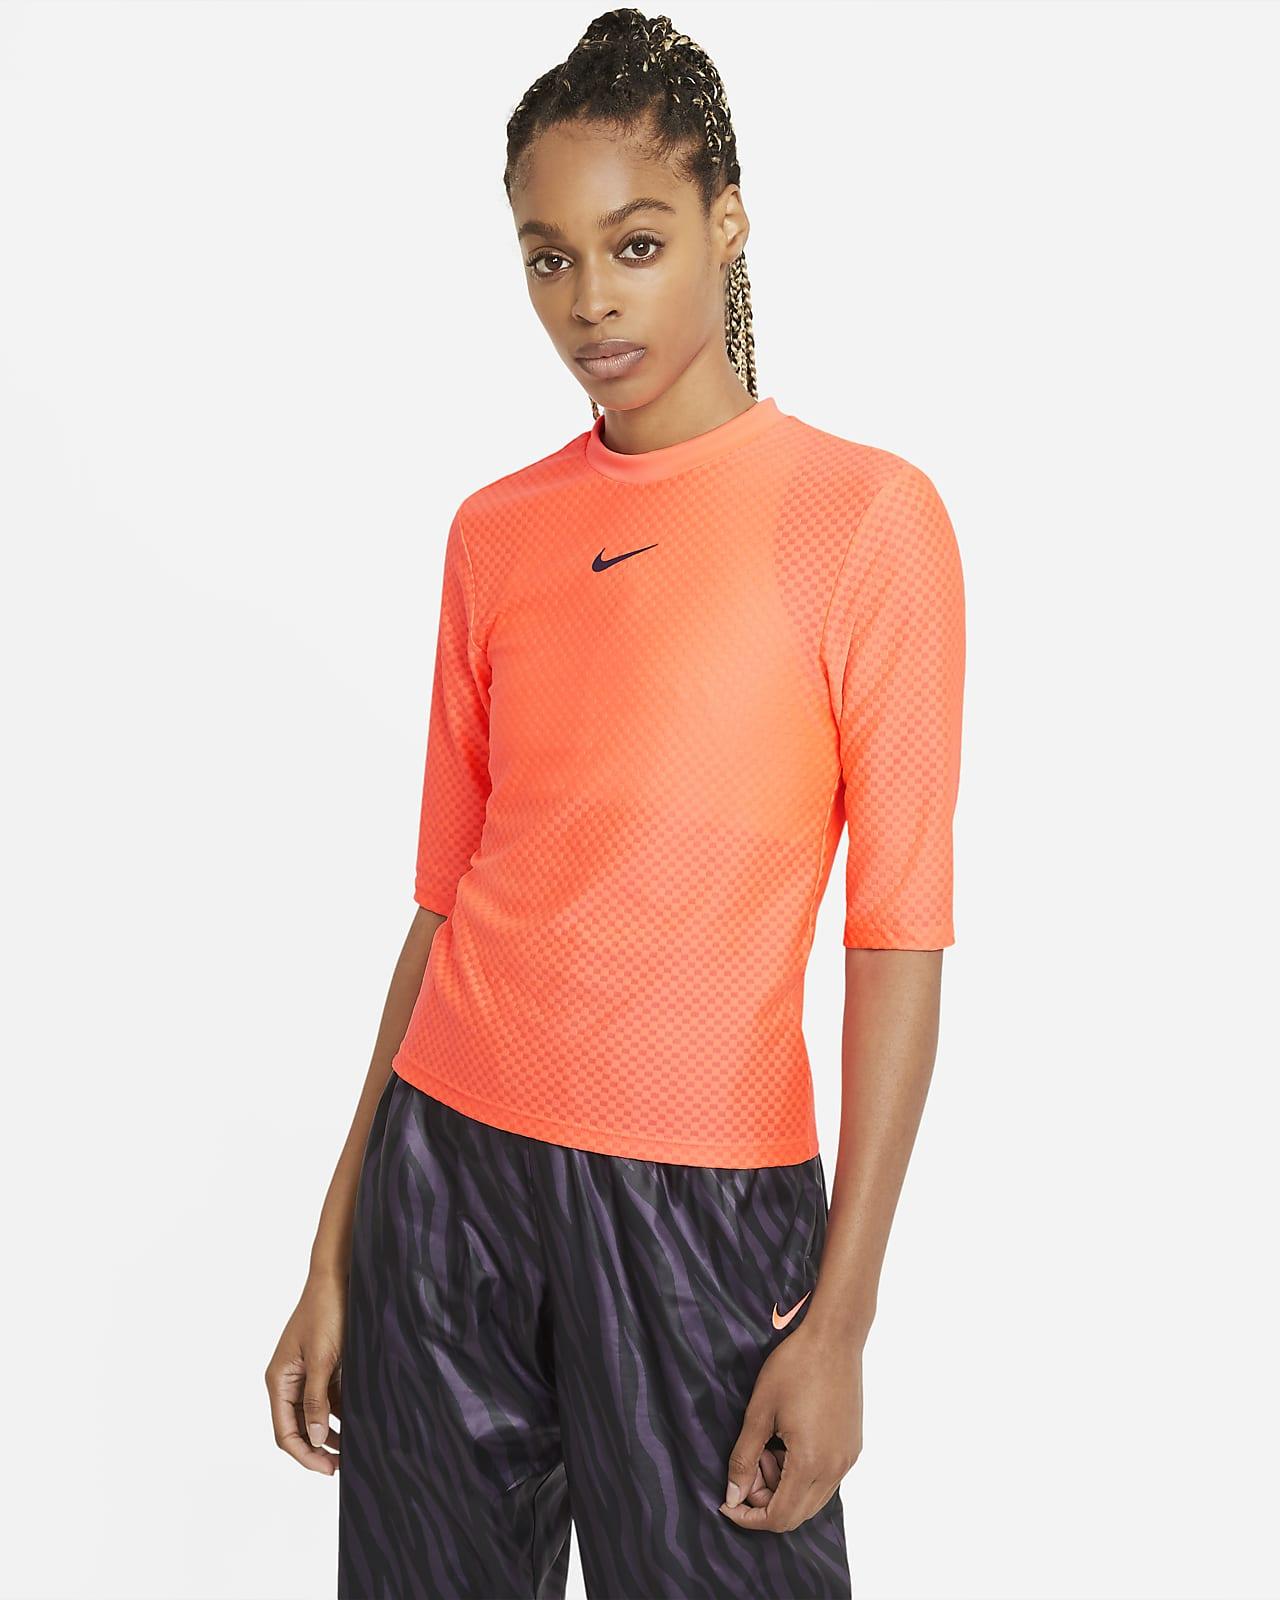 Topp Nike Sportswear Icon Clash för kvinnor